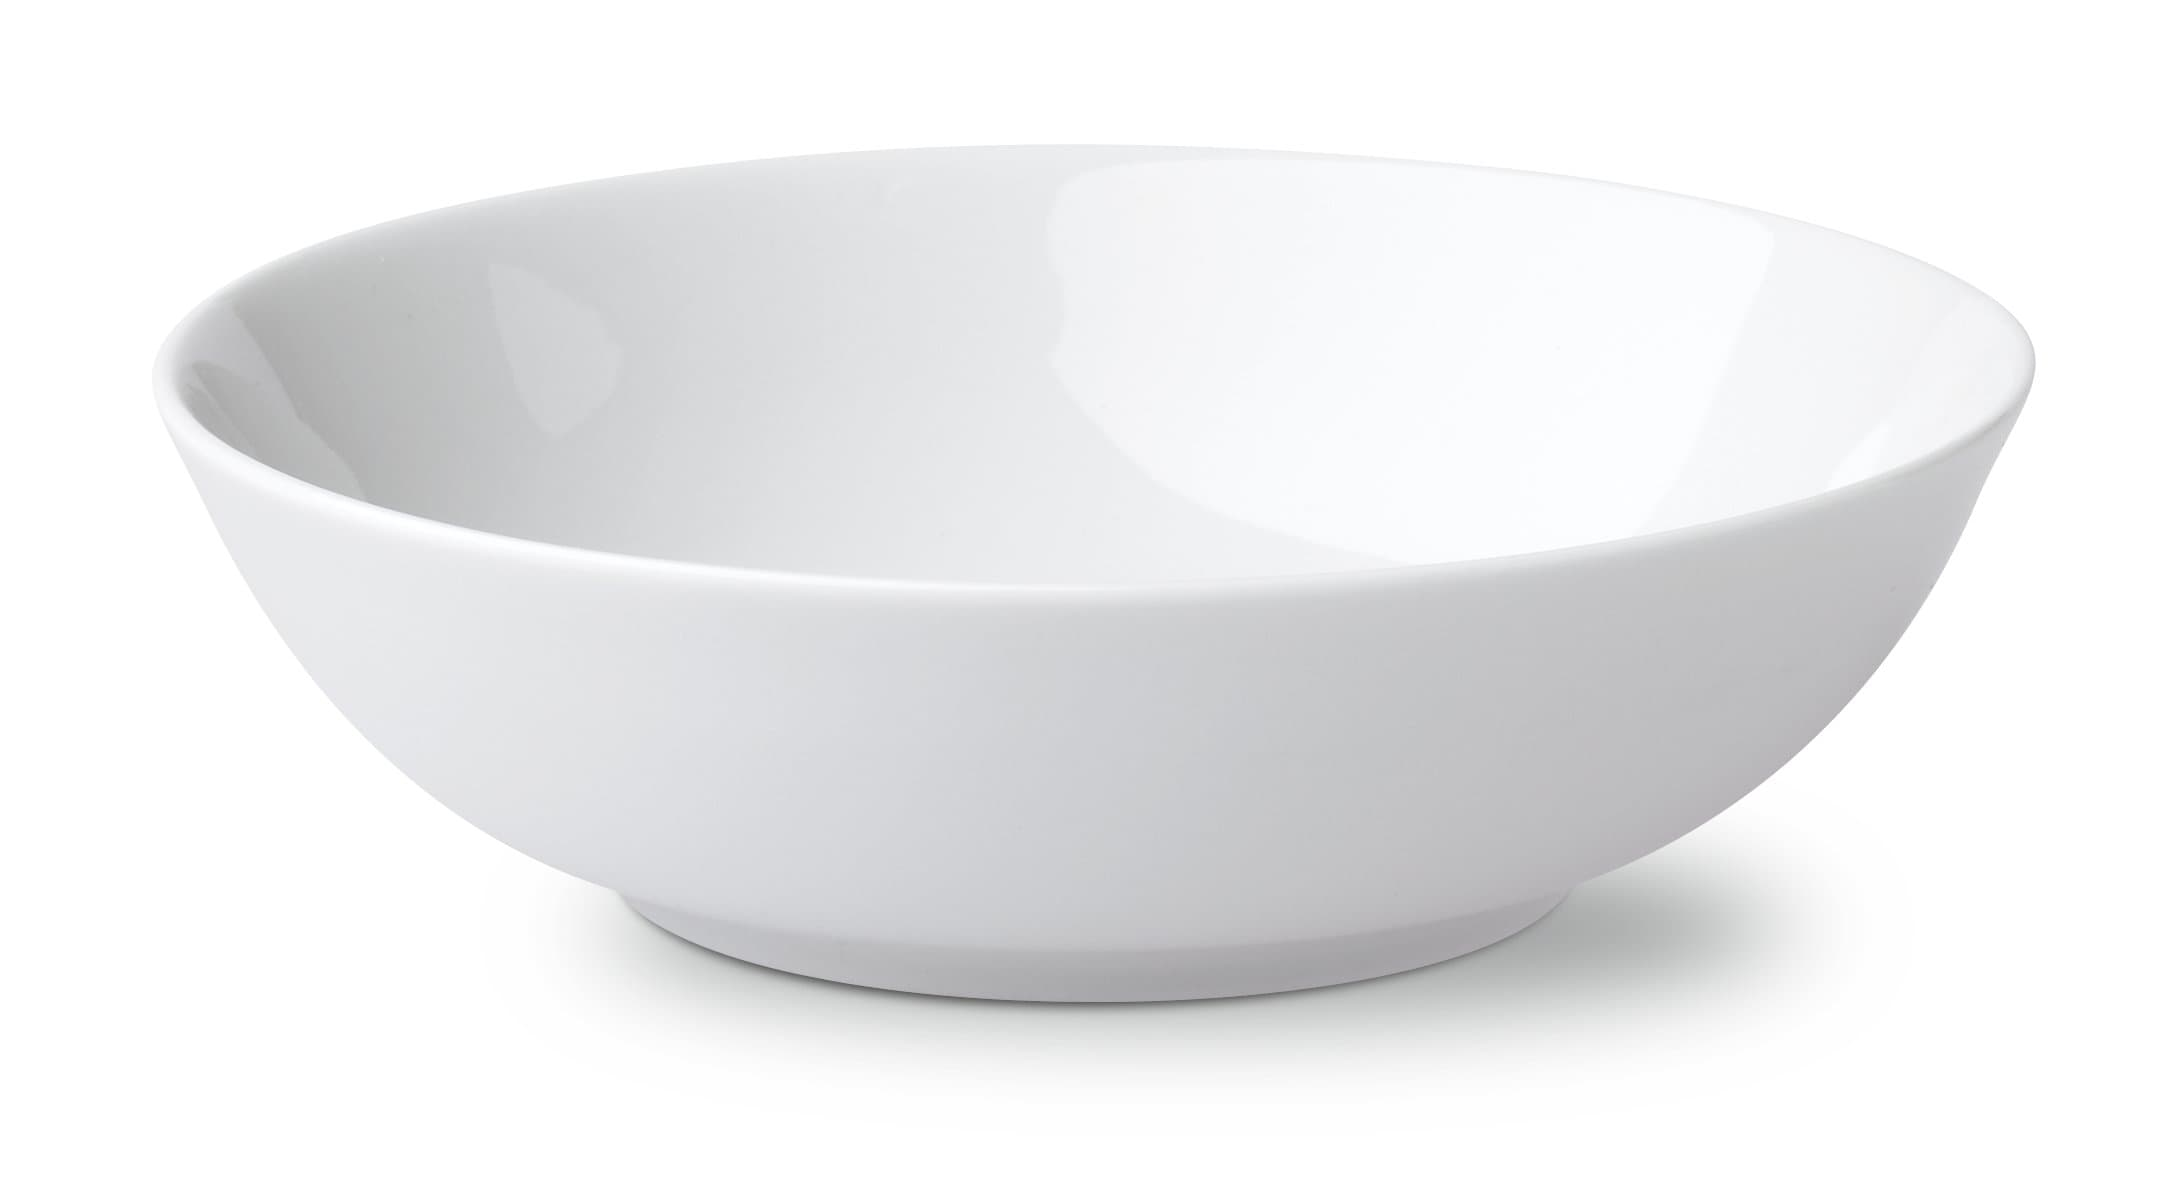 Cucina & Tavola SUNRISE Bowl